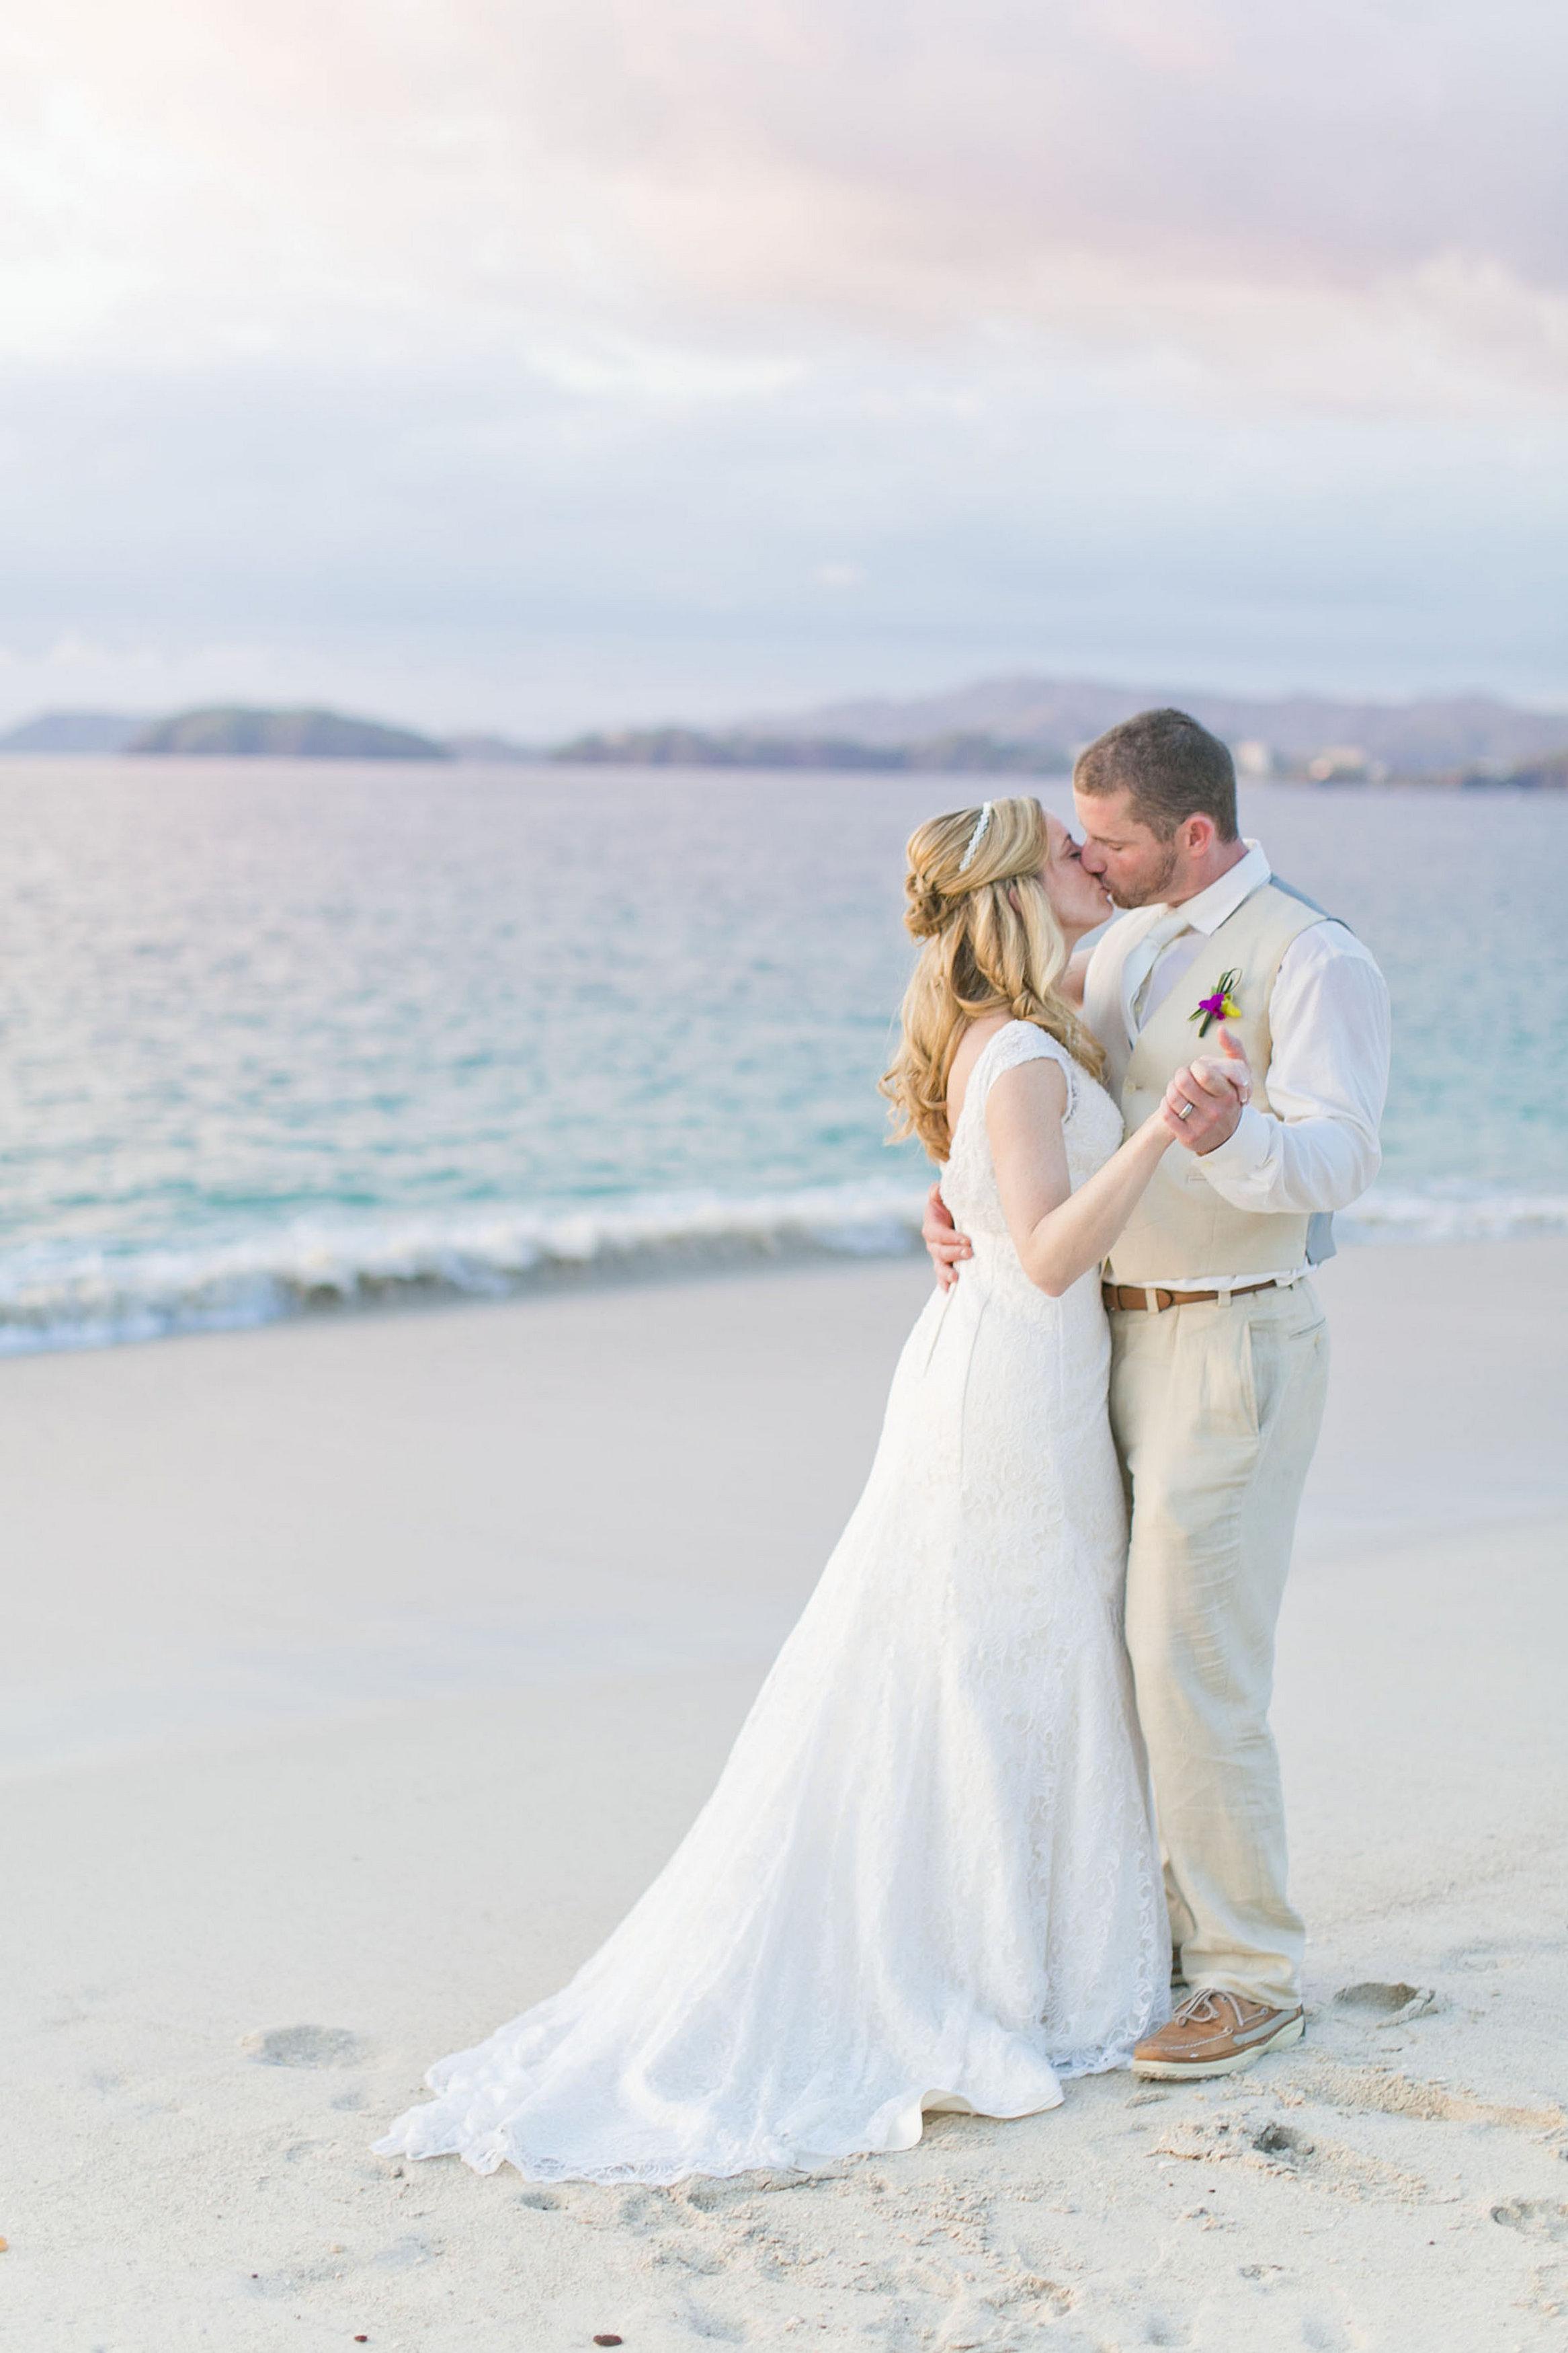 COSTA RICA DESTINATION WEDDING:  ALISA + STEVE